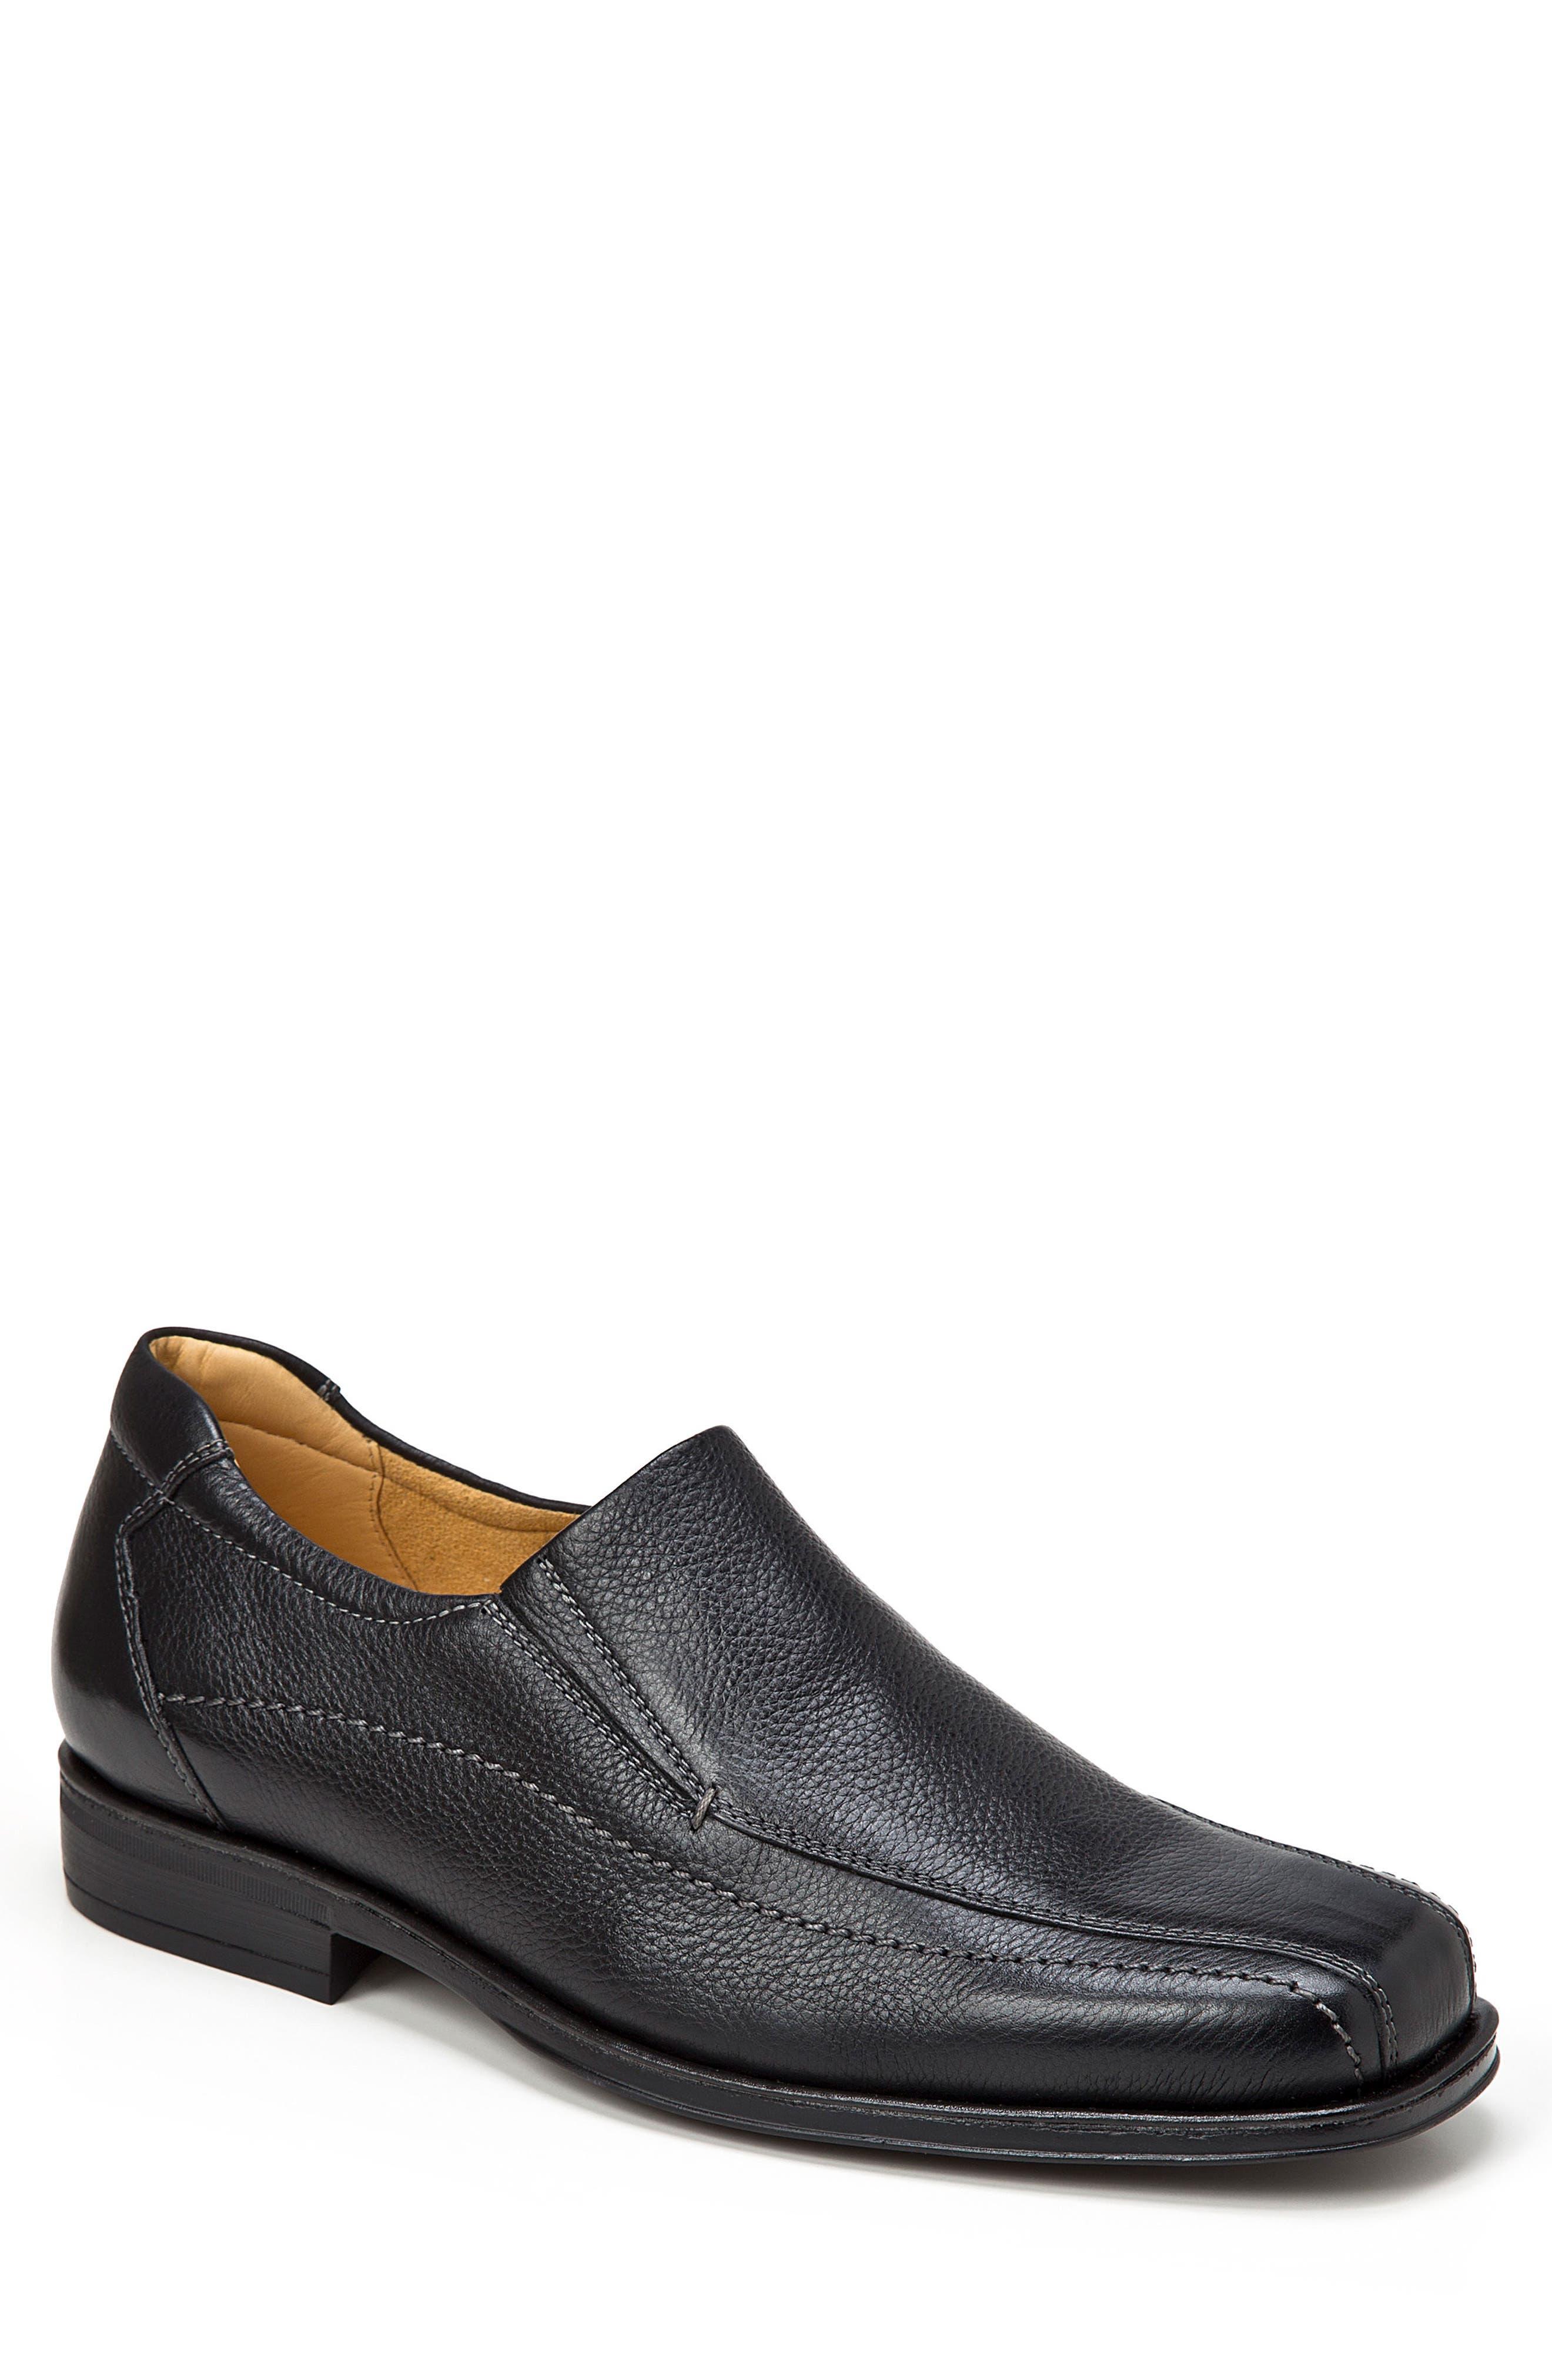 Elgin Venetian Loafer,                             Main thumbnail 1, color,                             Black